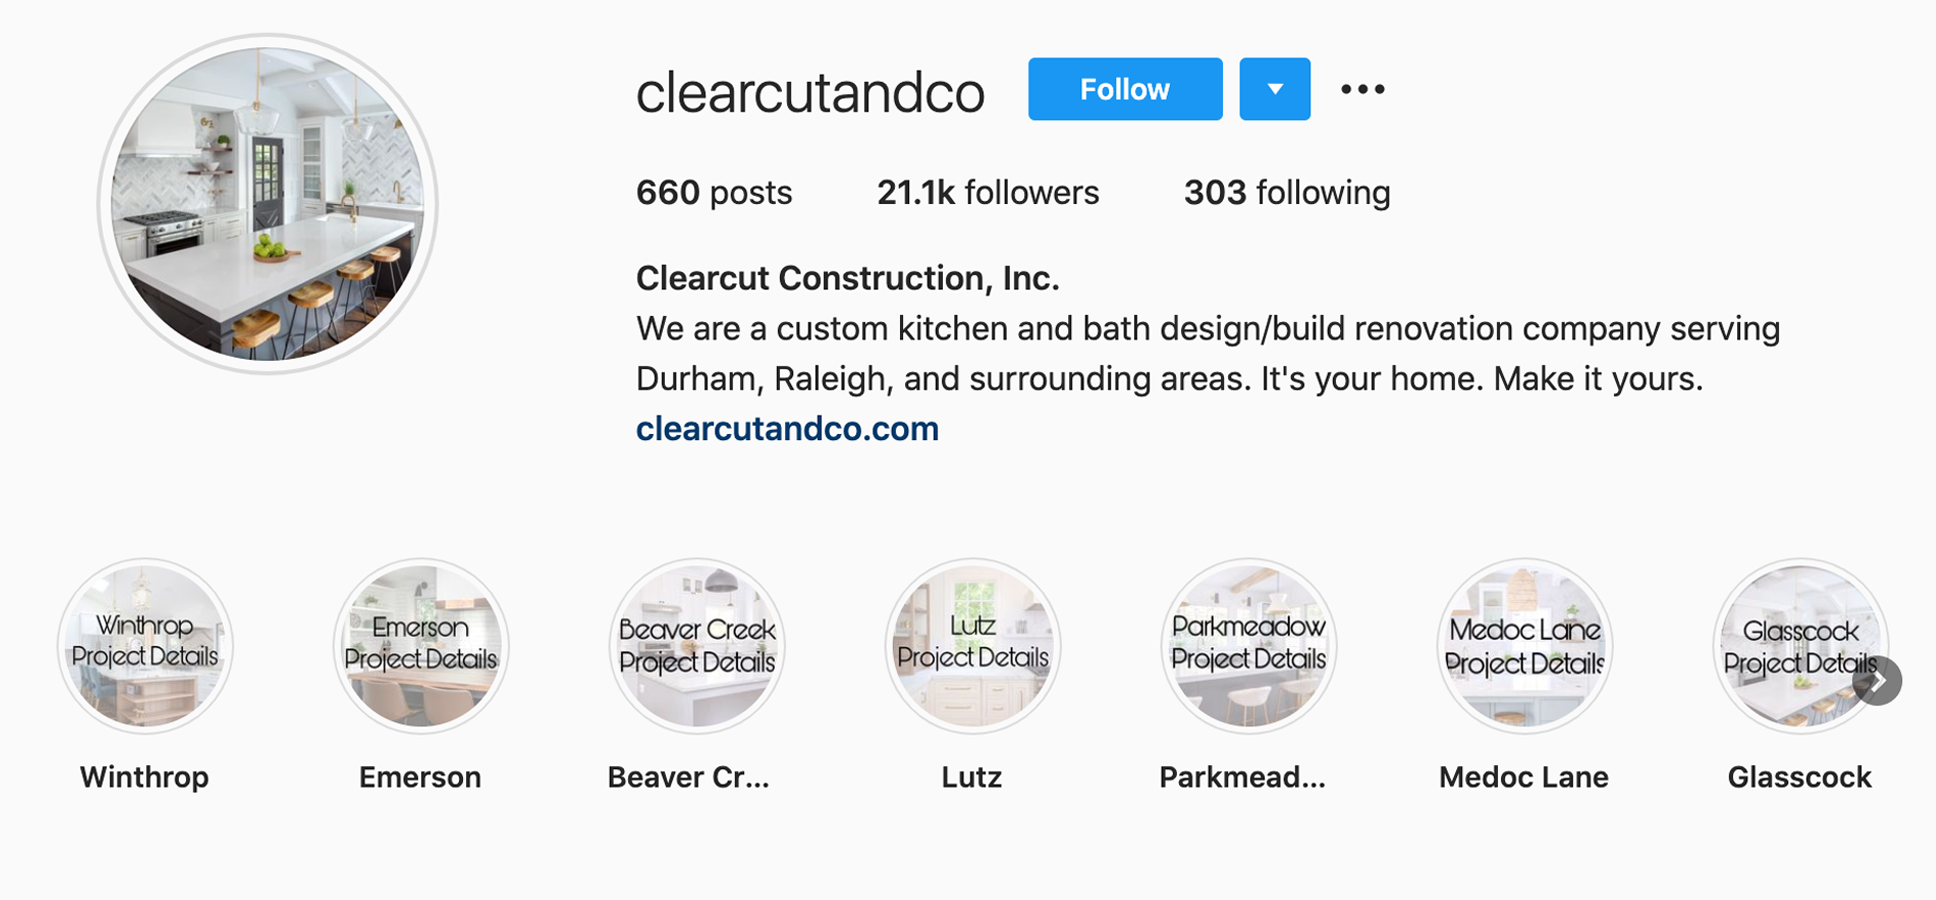 clearcut-construction-inc-clearcutandco-instagram-profile